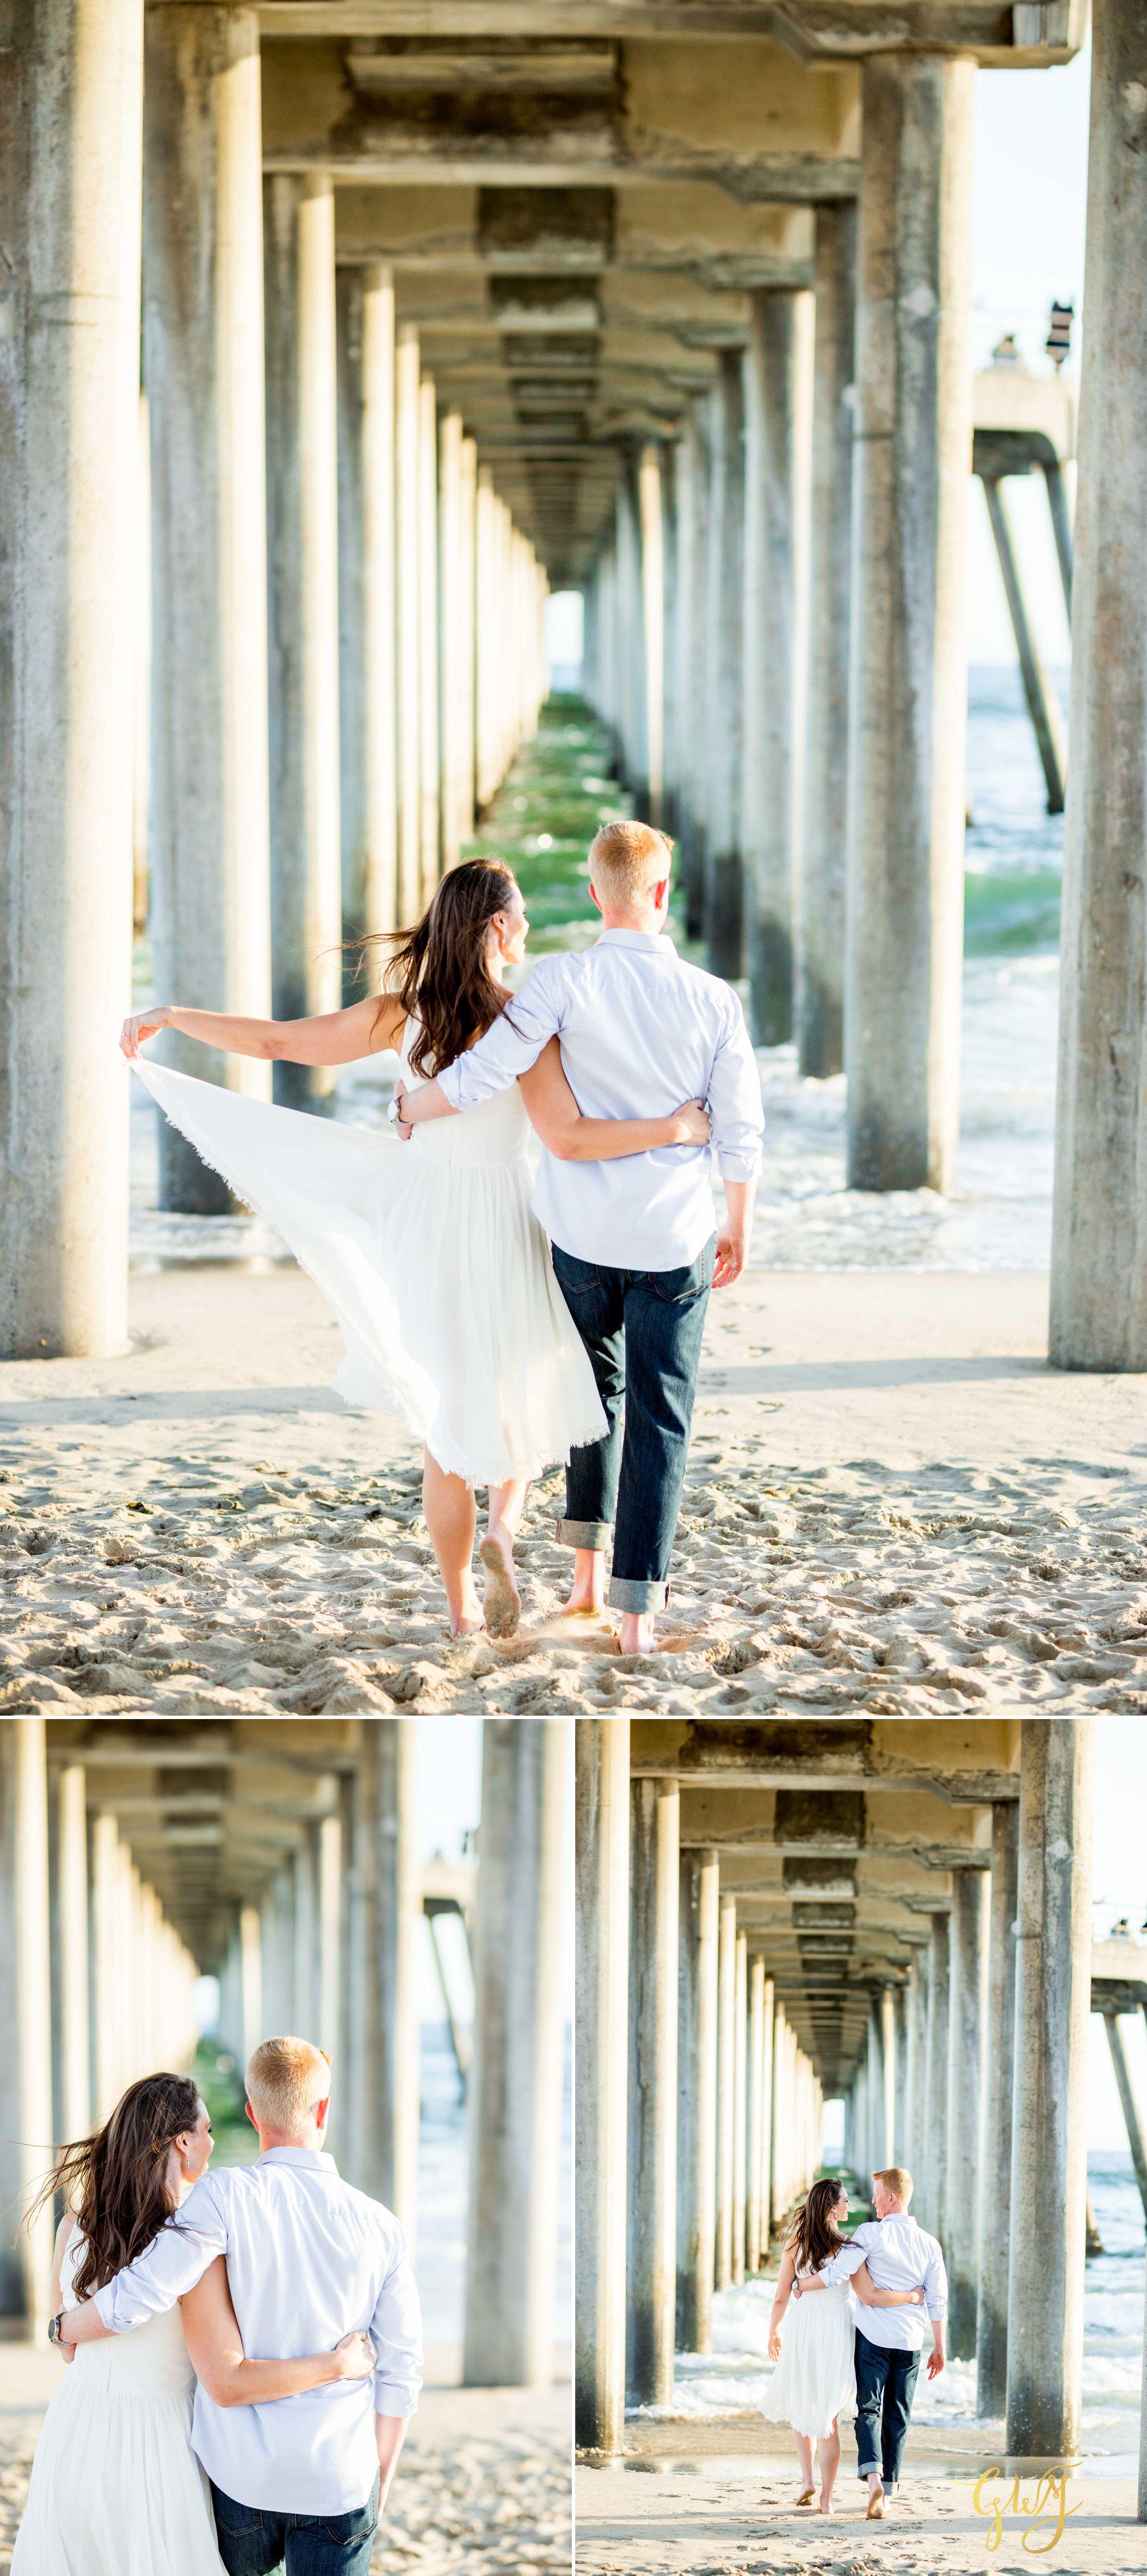 2019.05.27 - Ryley + Tolalf Romantic Summer Huntington Beach + HB Central Park Engagement Session by Glass Woods Media 8.jpg